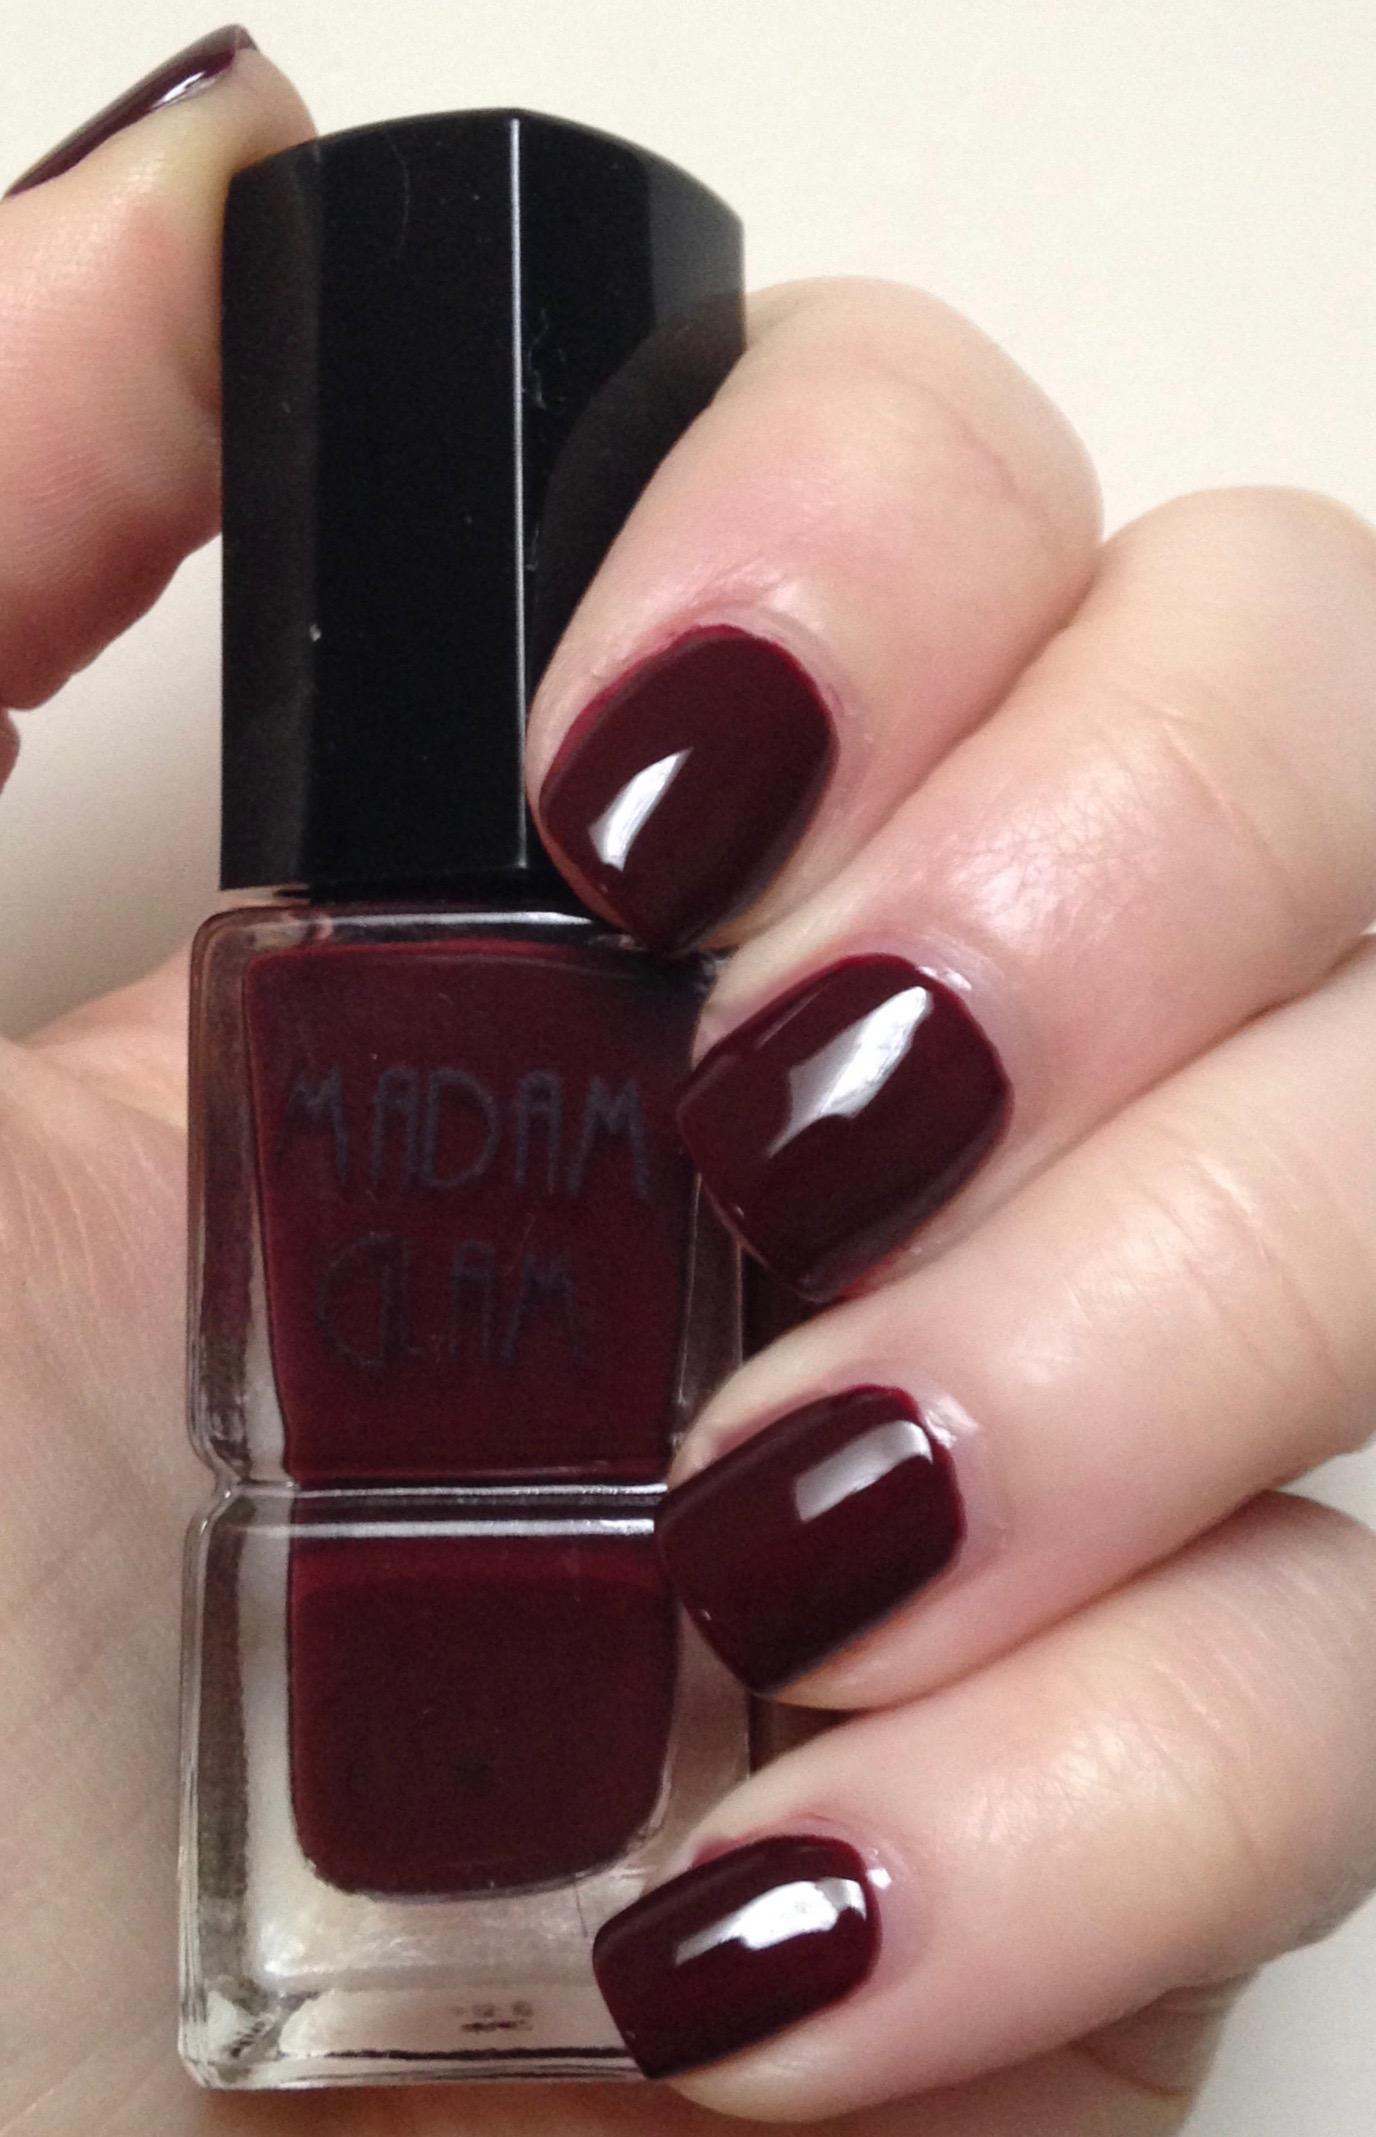 Dare to Compare | Sally Hansen Miracle Gel Wine Stock vs Madam Glam ...